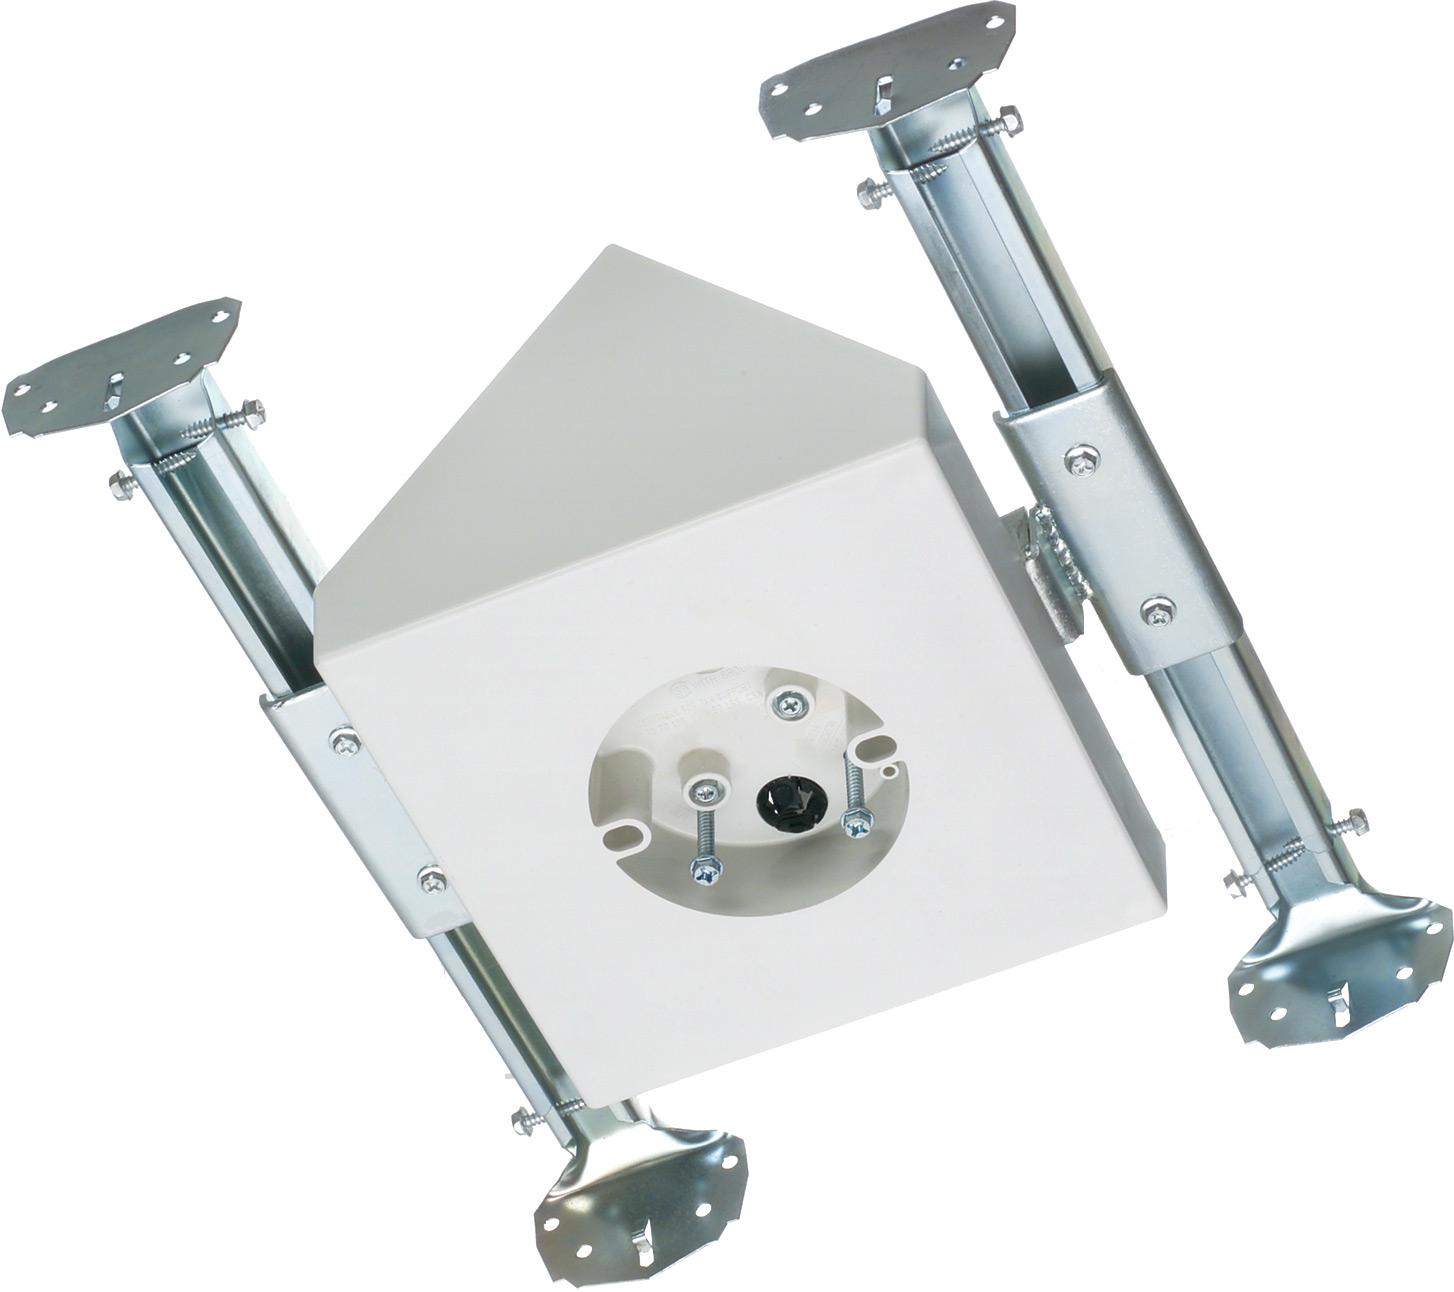 arlington fbx900 fan fixture mounting box w adjustable brackets. Black Bedroom Furniture Sets. Home Design Ideas